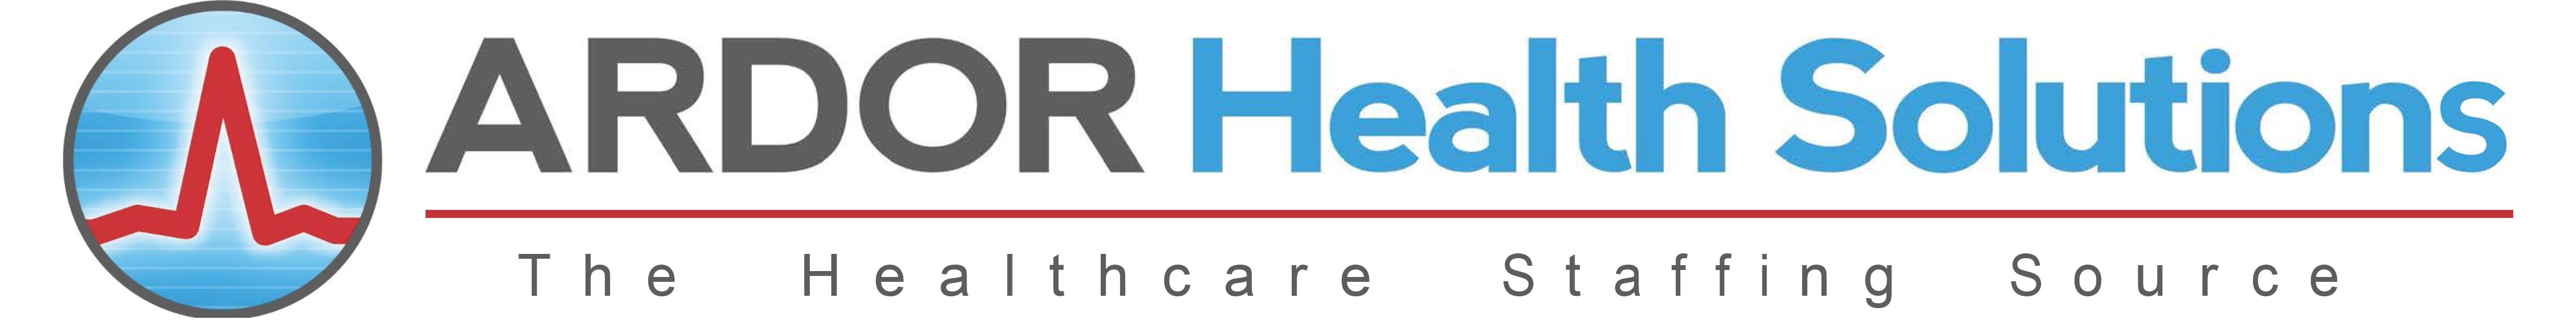 Ardor Health Solutions Logo